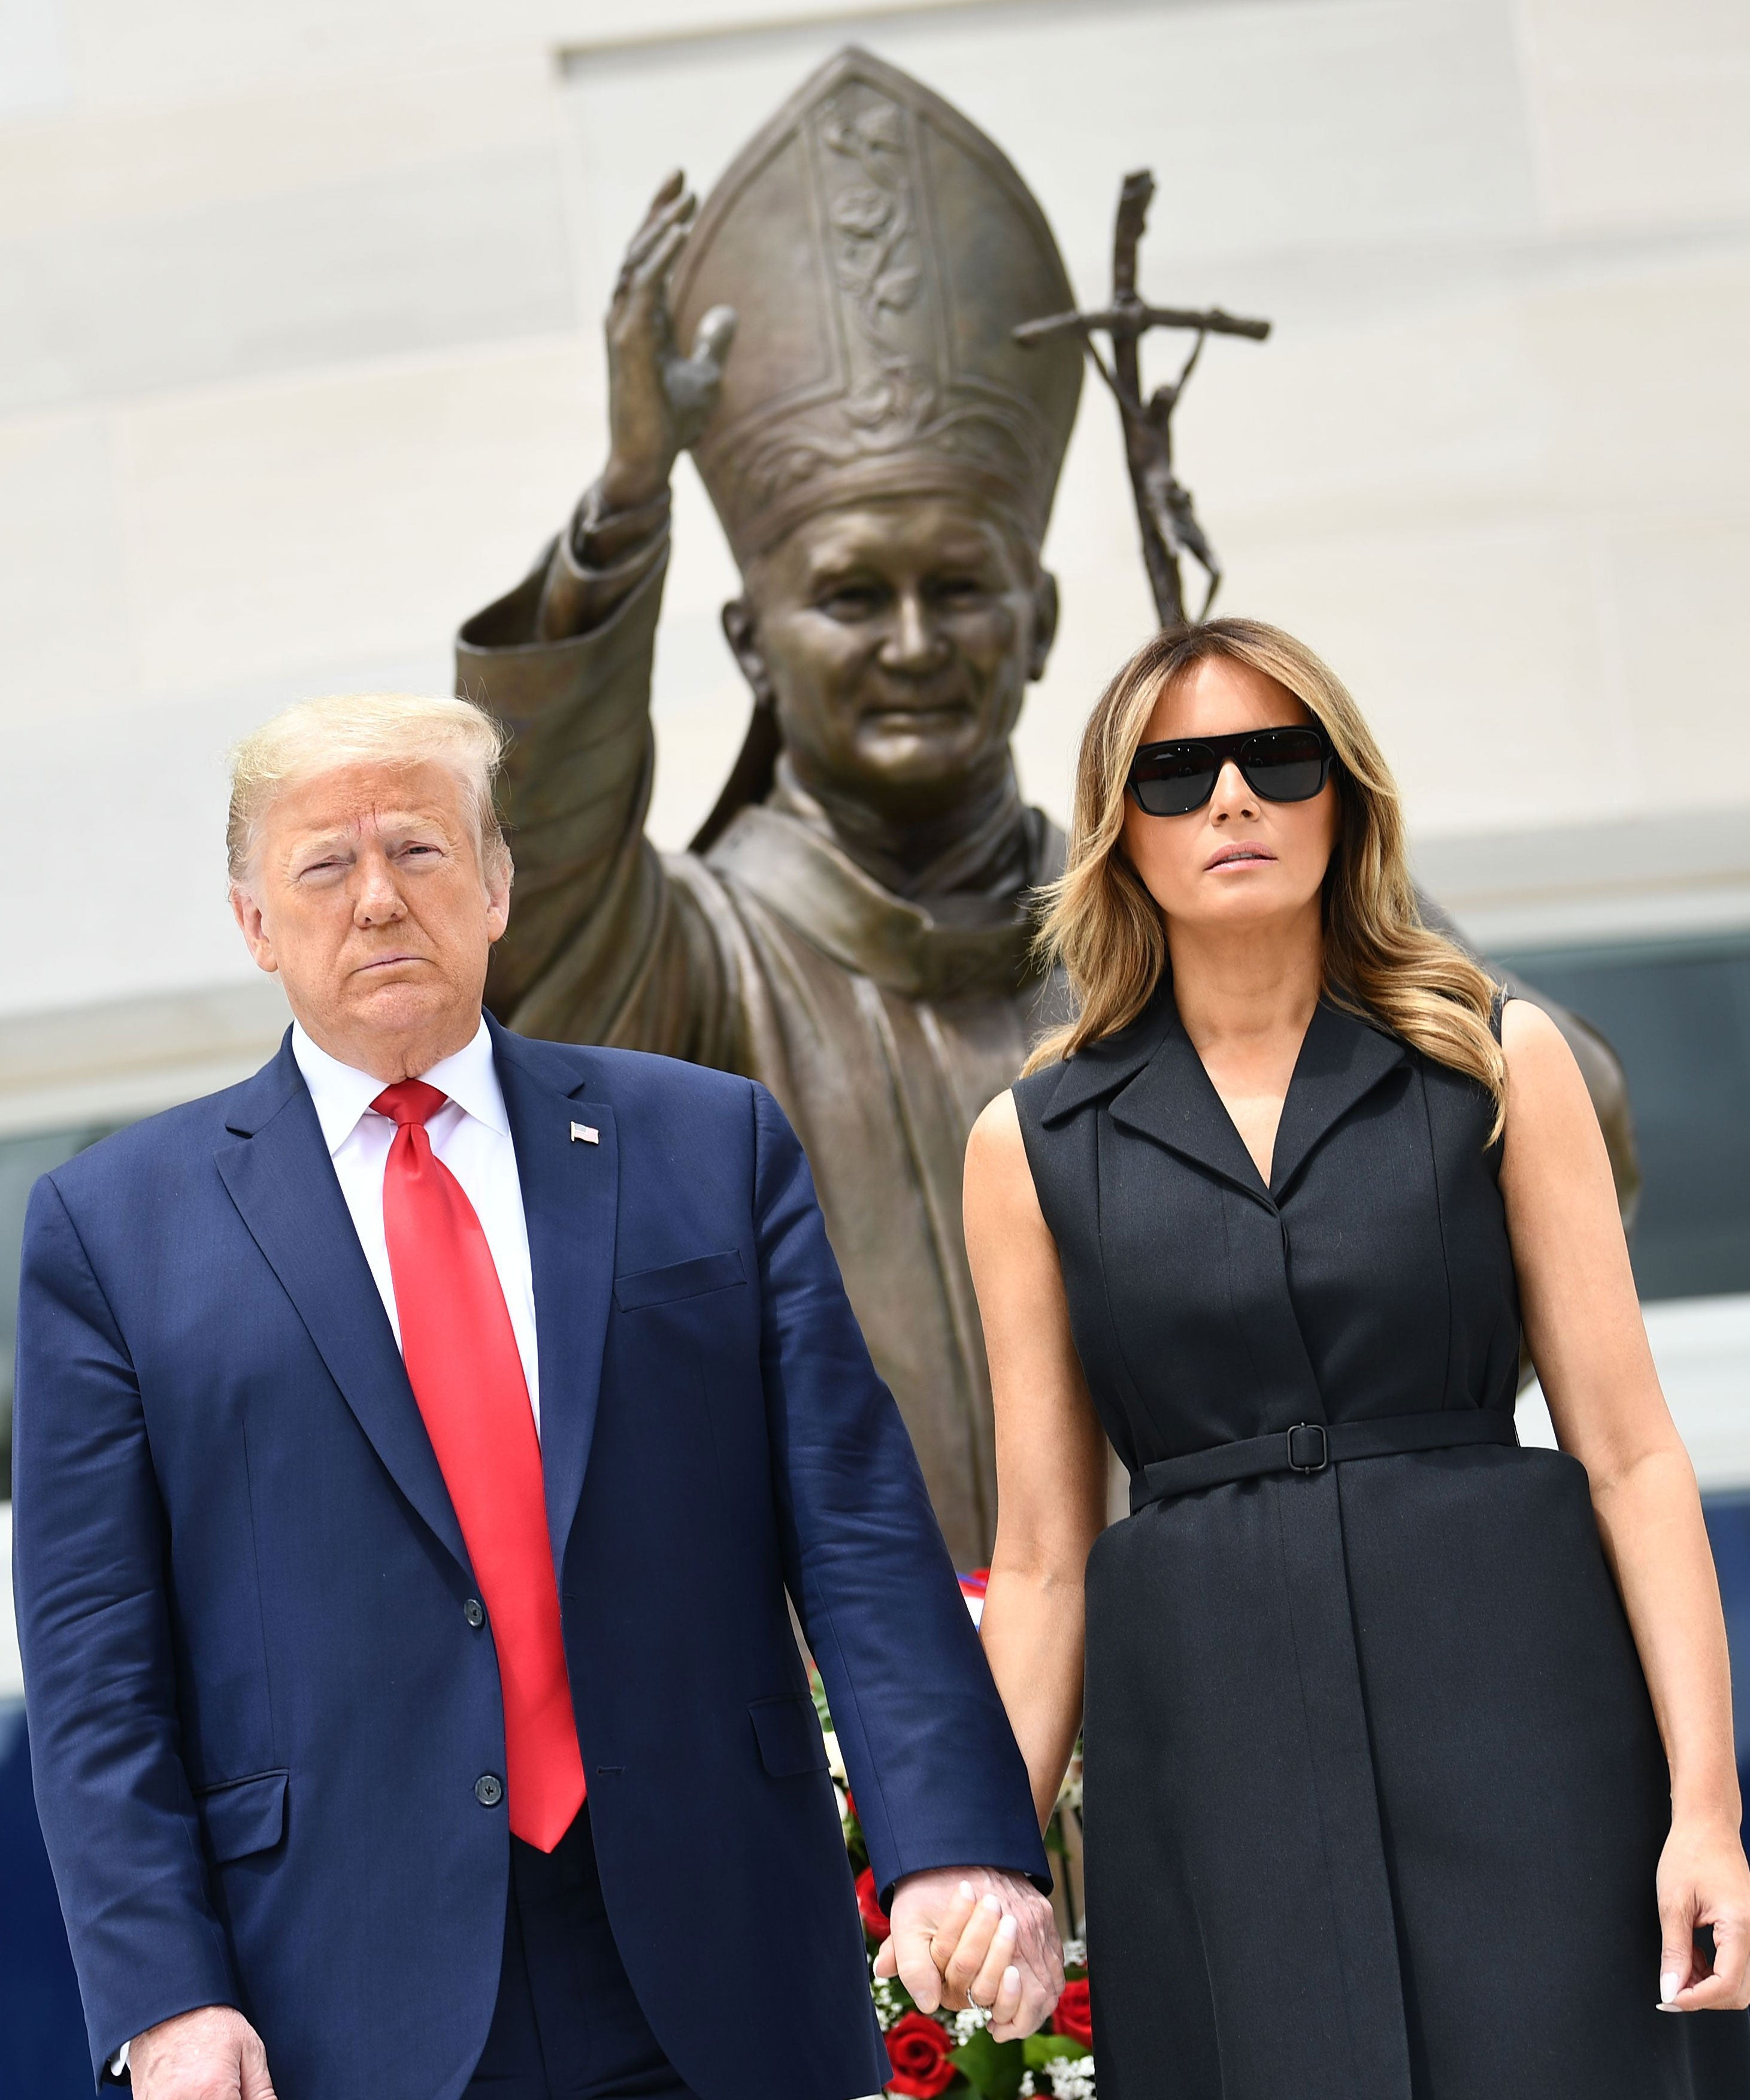 Melania & Trump Religious Photos Are Straight Up Creepy